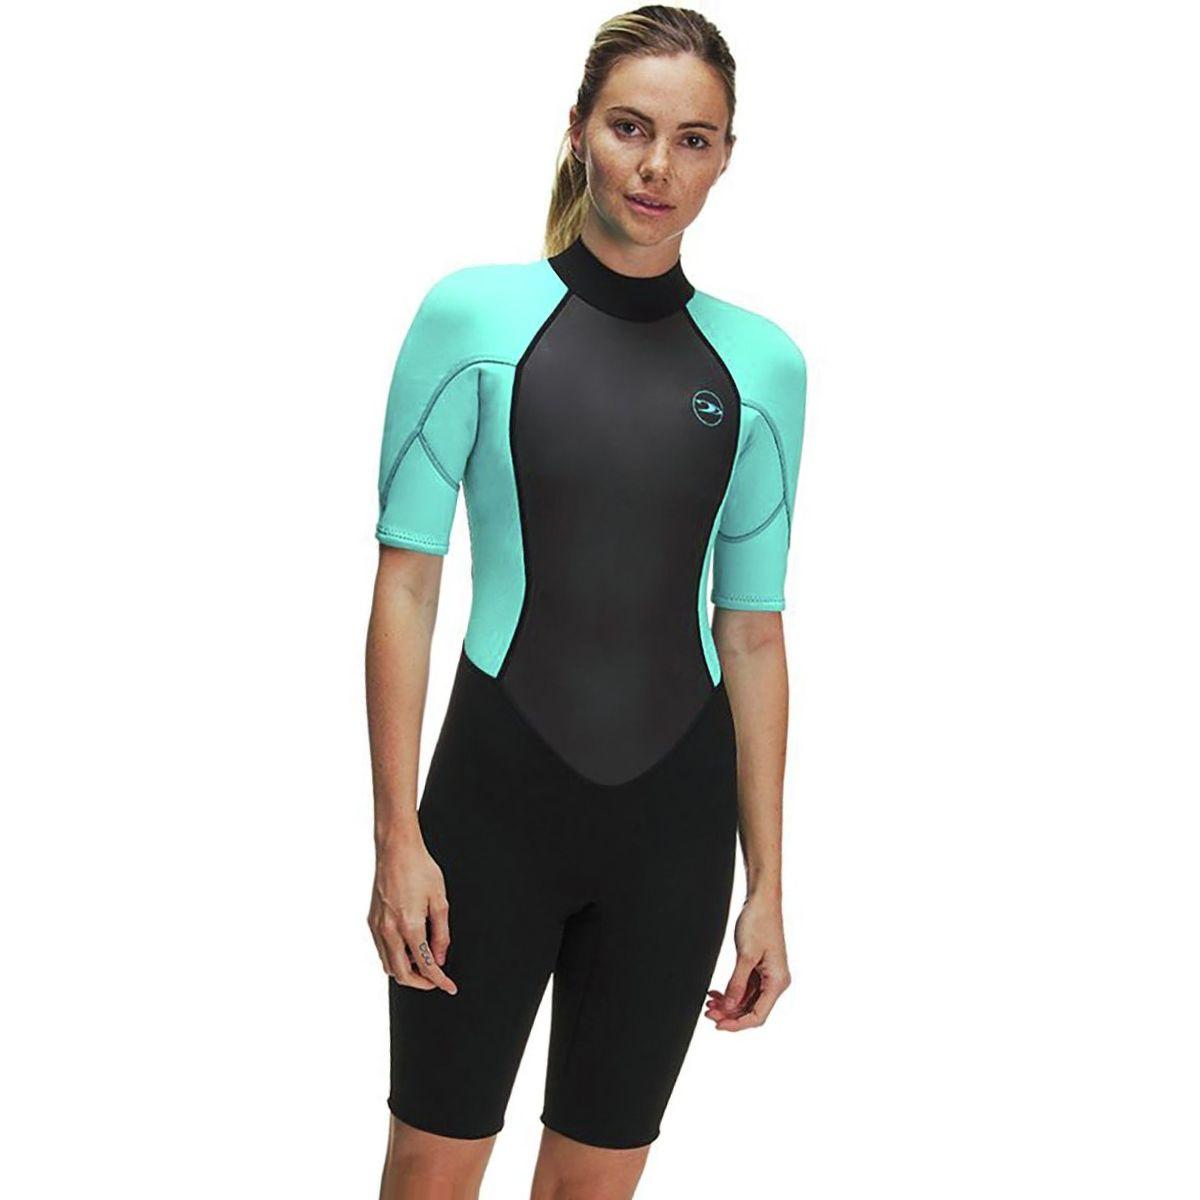 O'Neill Reactor II 3/2 Back-Zip Spring Wetsuit - Women's